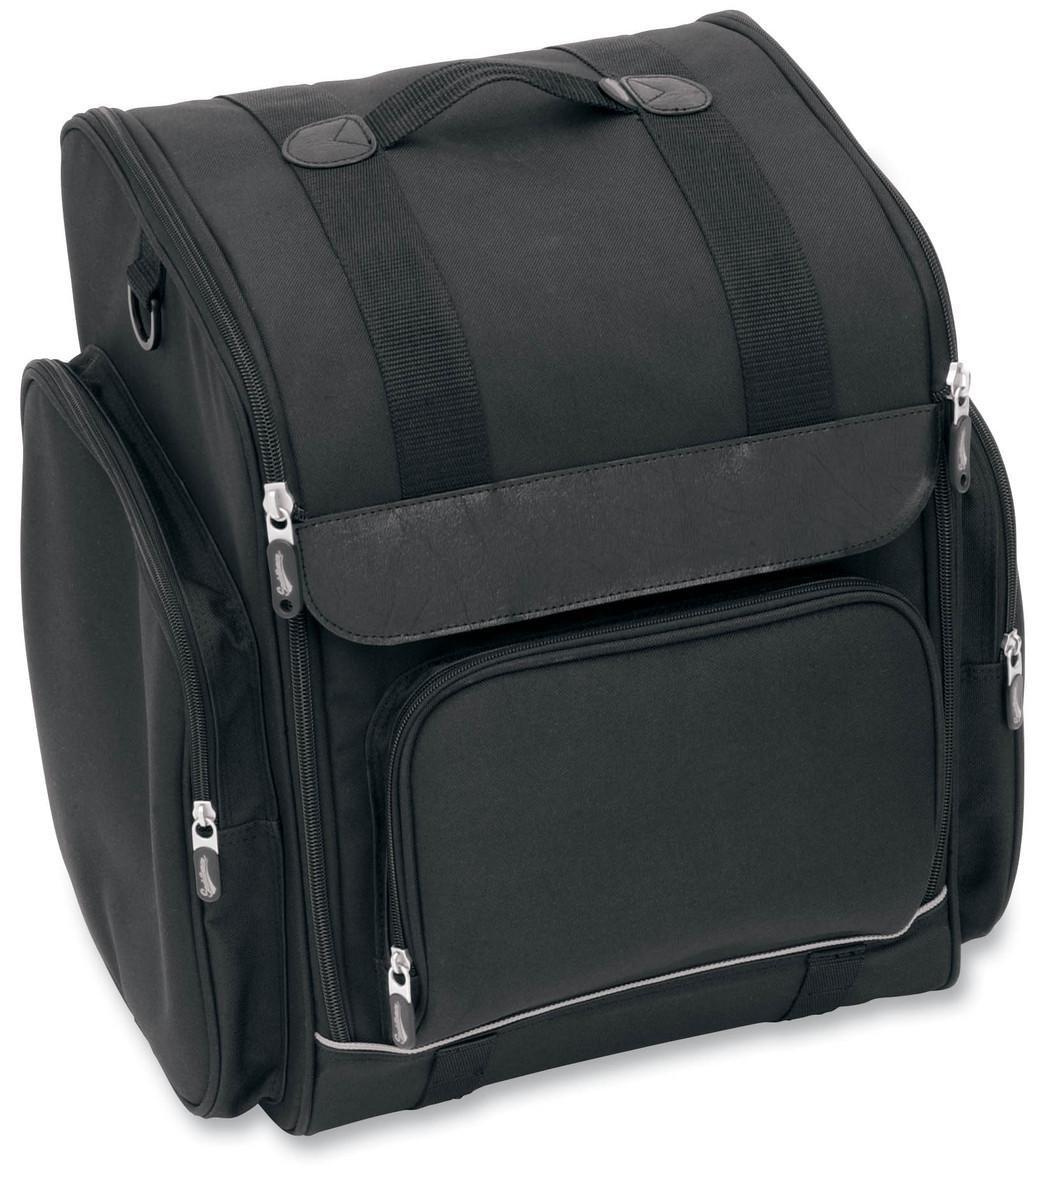 Borsa Sissy Bar Bag SSR1900 SADDLEMEN Harley Davidson Moto Custom Turismo Viaggi 3515-0078